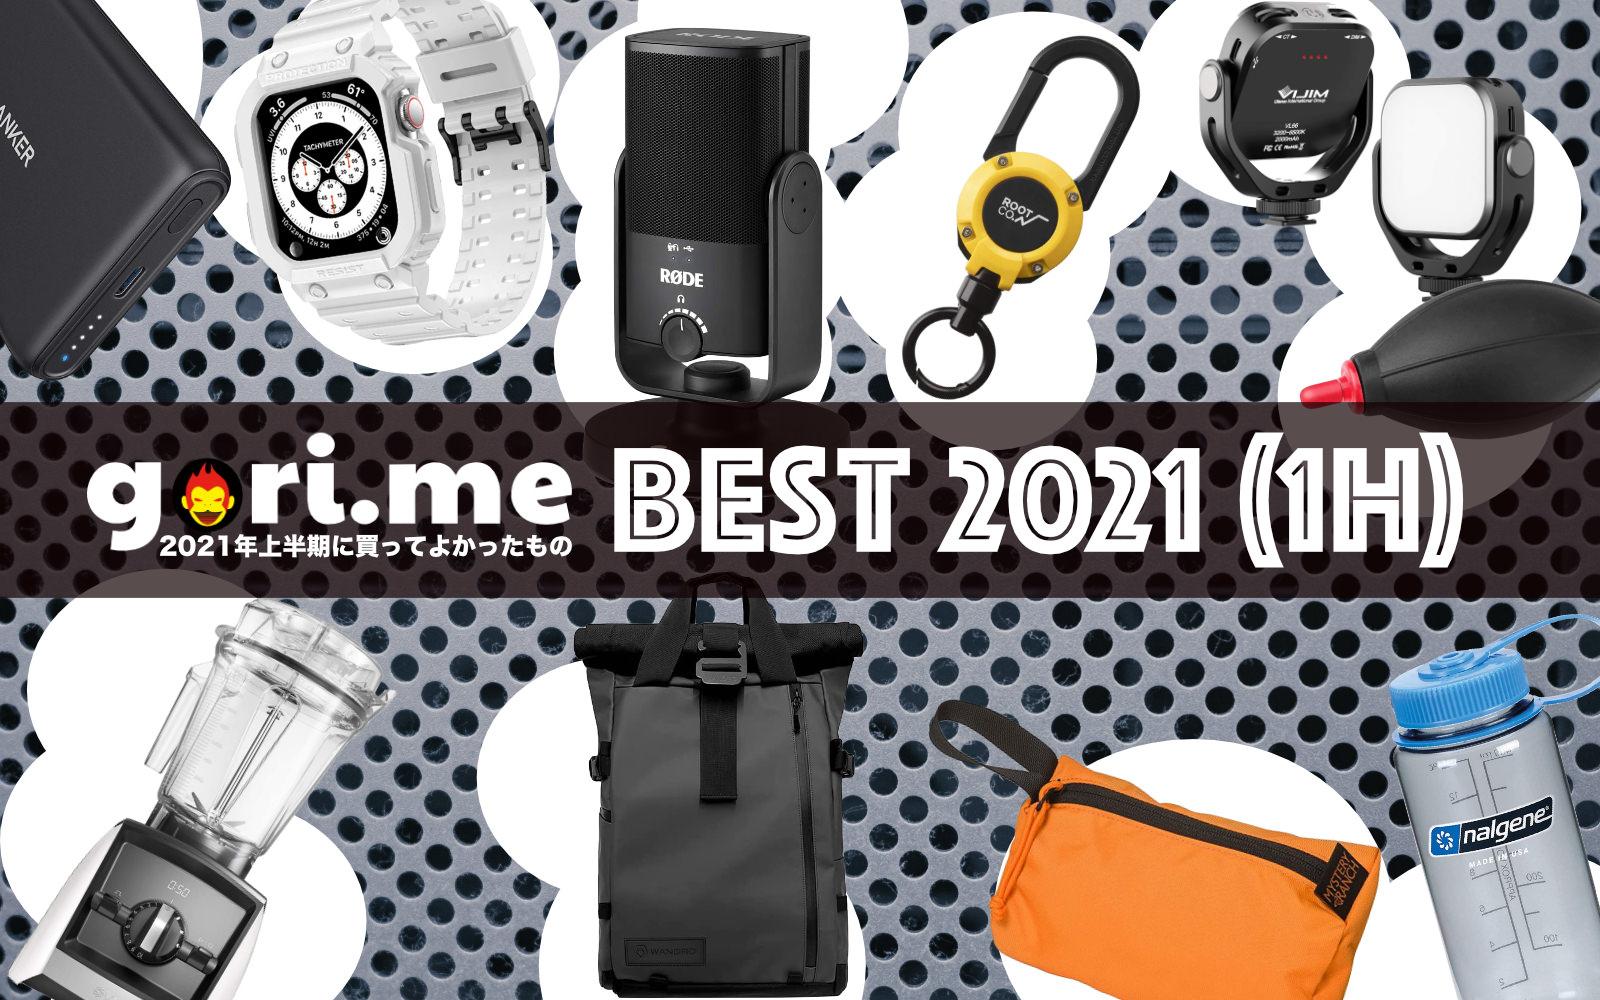 GoriMe Best 2021 1H